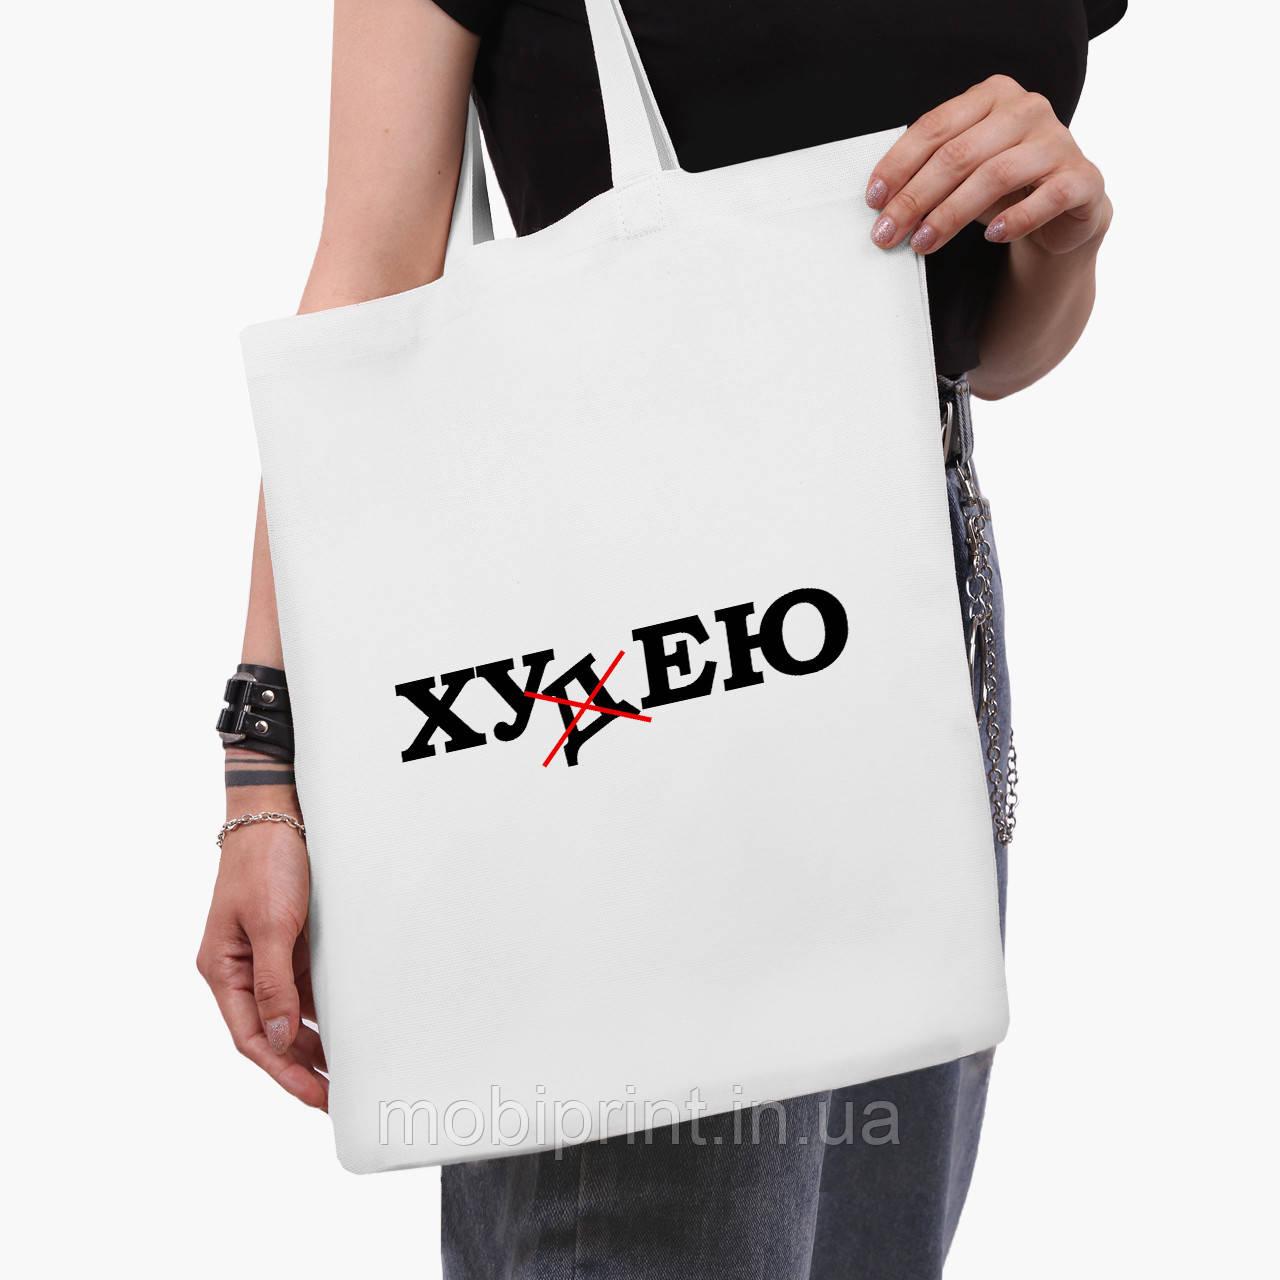 Еко сумка шоппер біла Худну (Lose weight) (9227-1286-3) 41*35 см